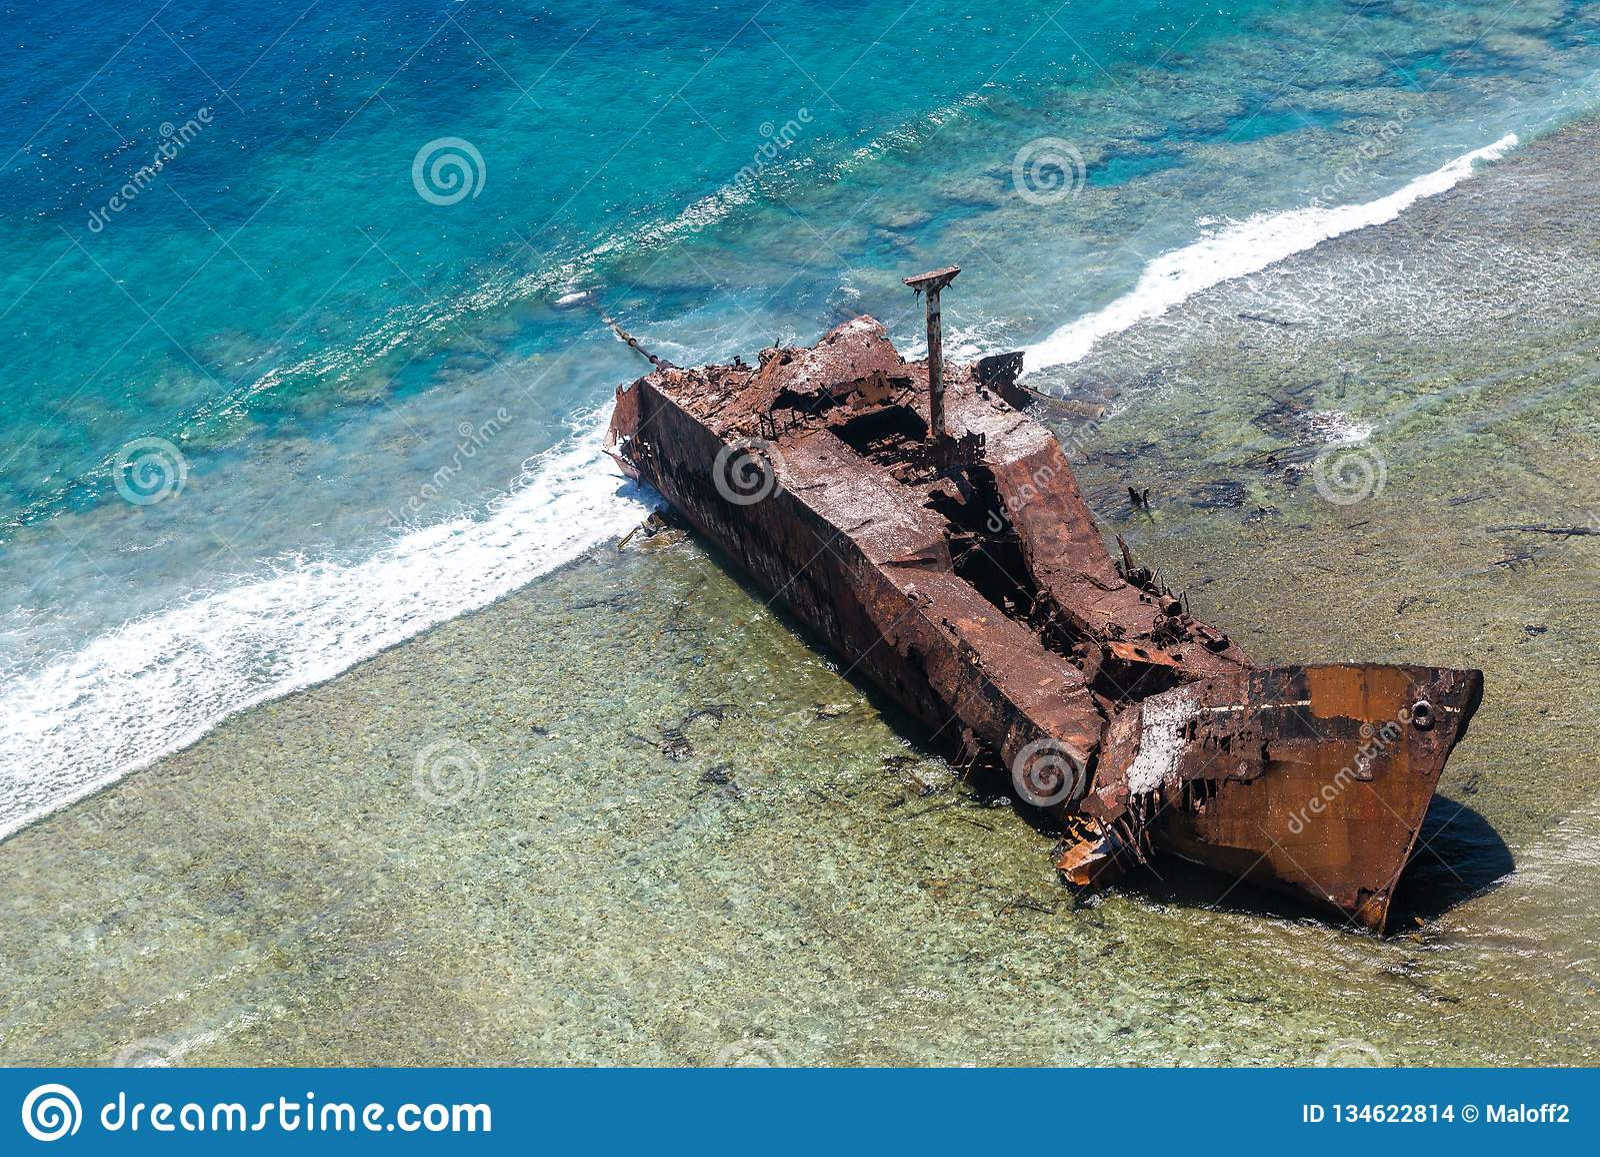 Aerial view of the shipwreck site of MV Ever Prosperity ship, Monrovia, Liberia. Coral sea, New Caledonia, Oceania.